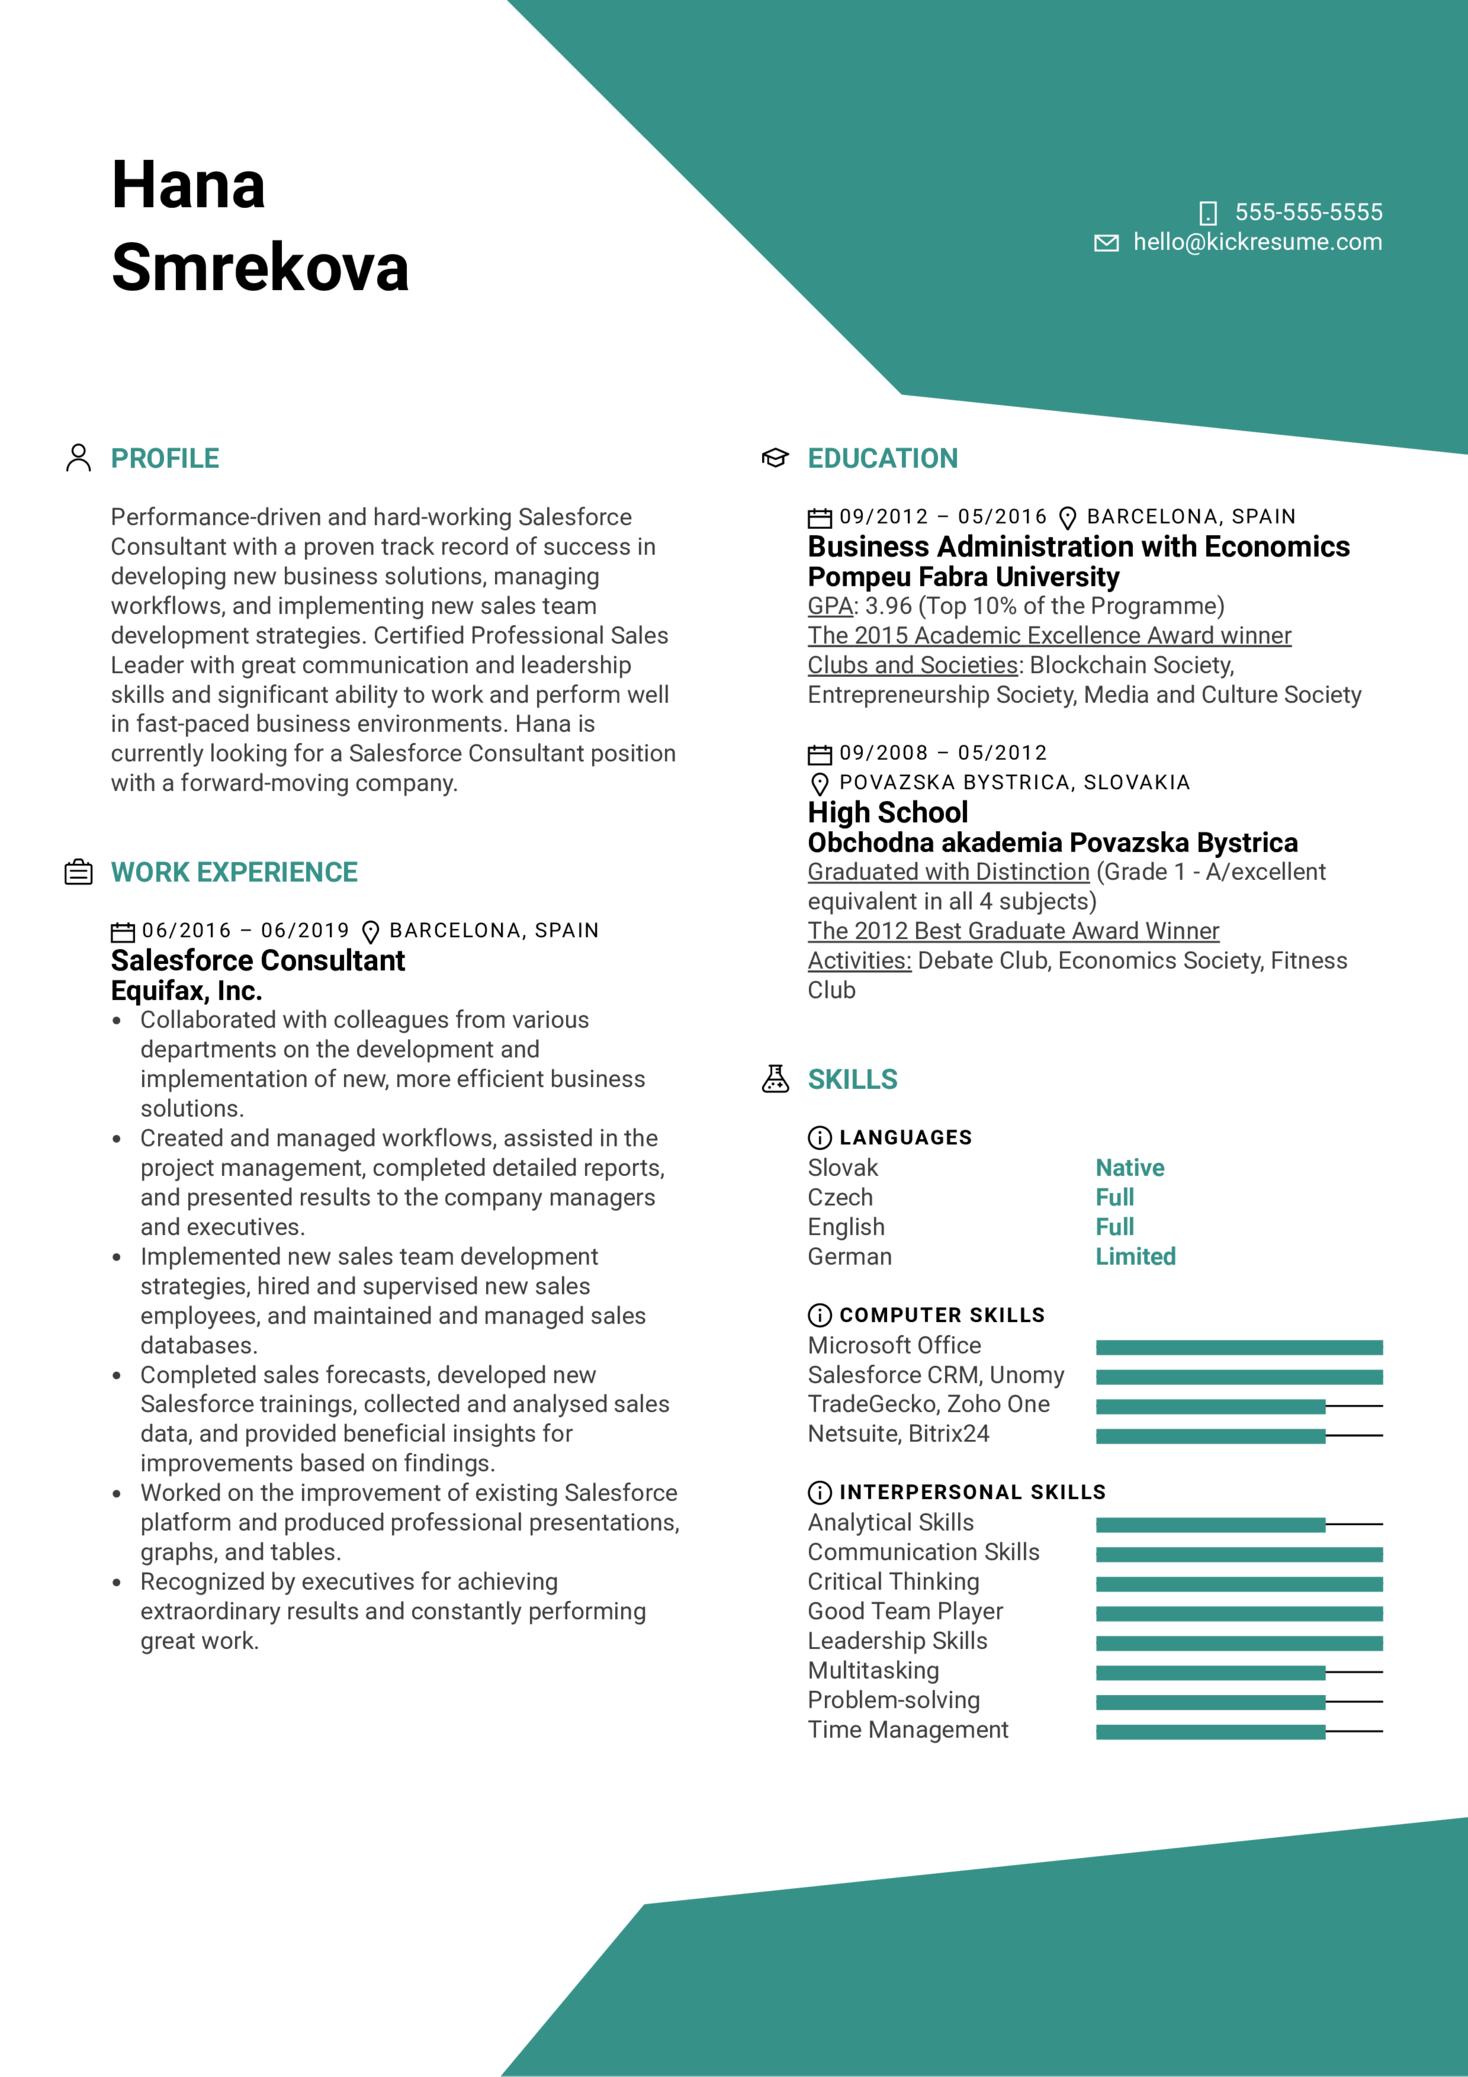 Salesforce Consultant Resume Example (parte 1)